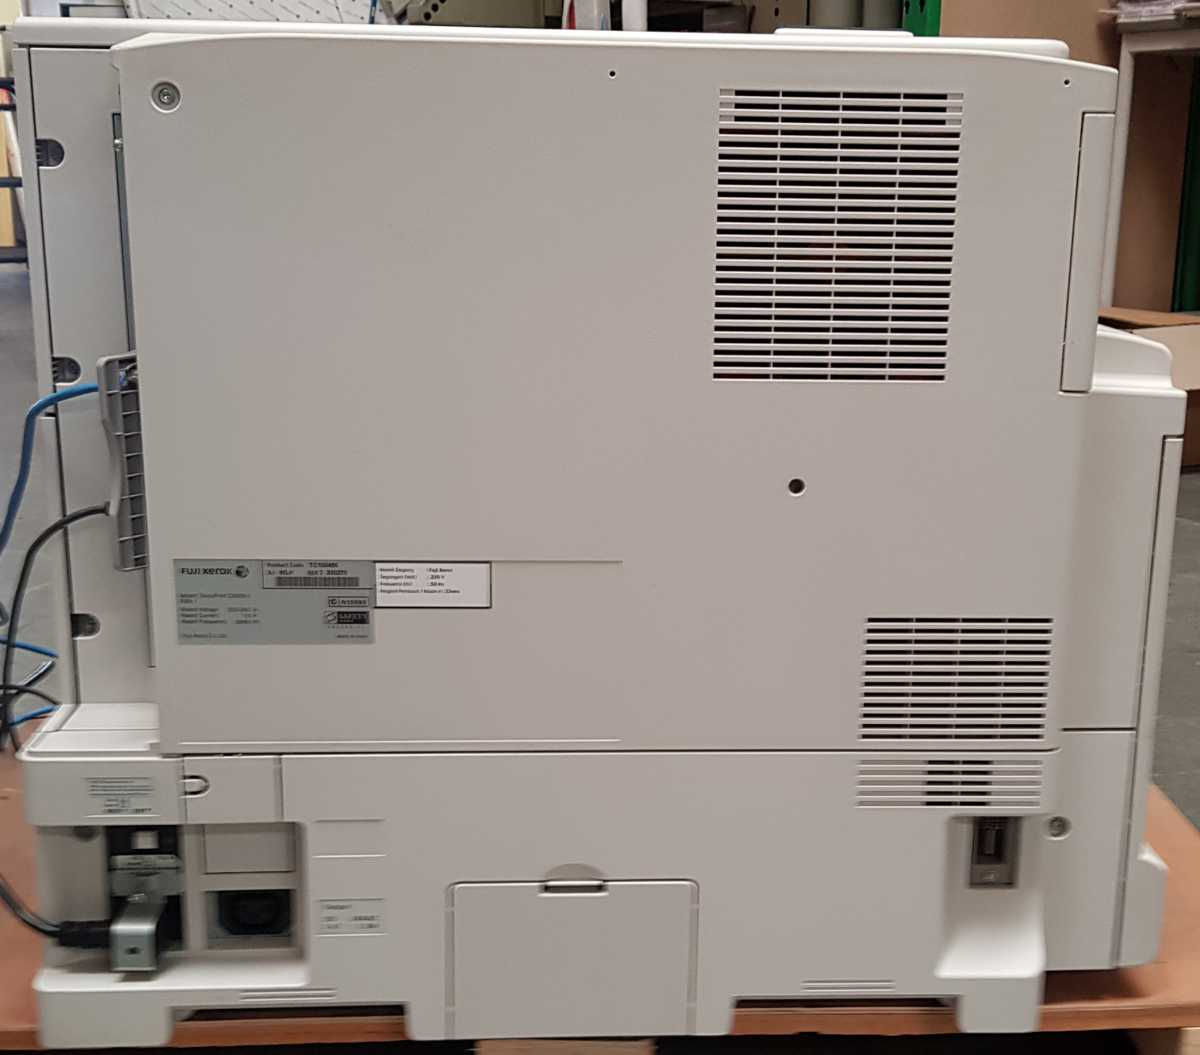 Xerox C5005d - back view